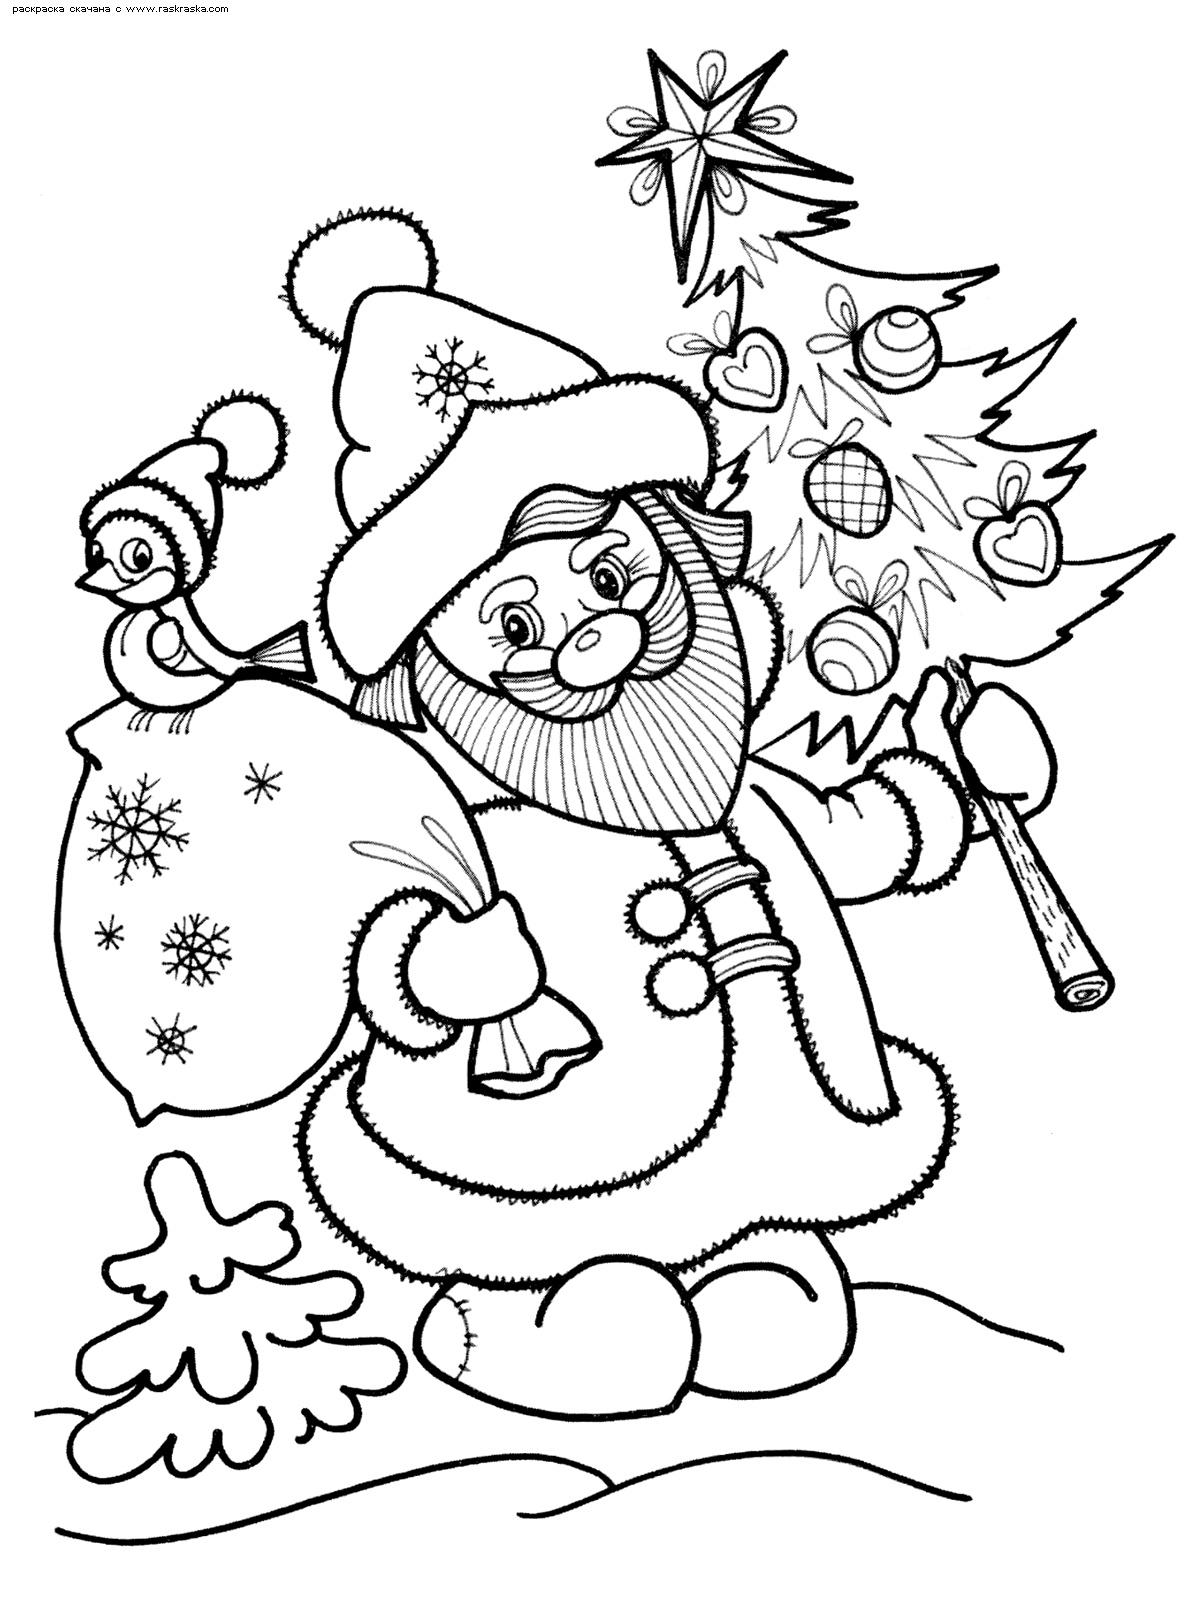 Раскраска Дедушка Мороз. Раскраска дед мороз, елка, мешок